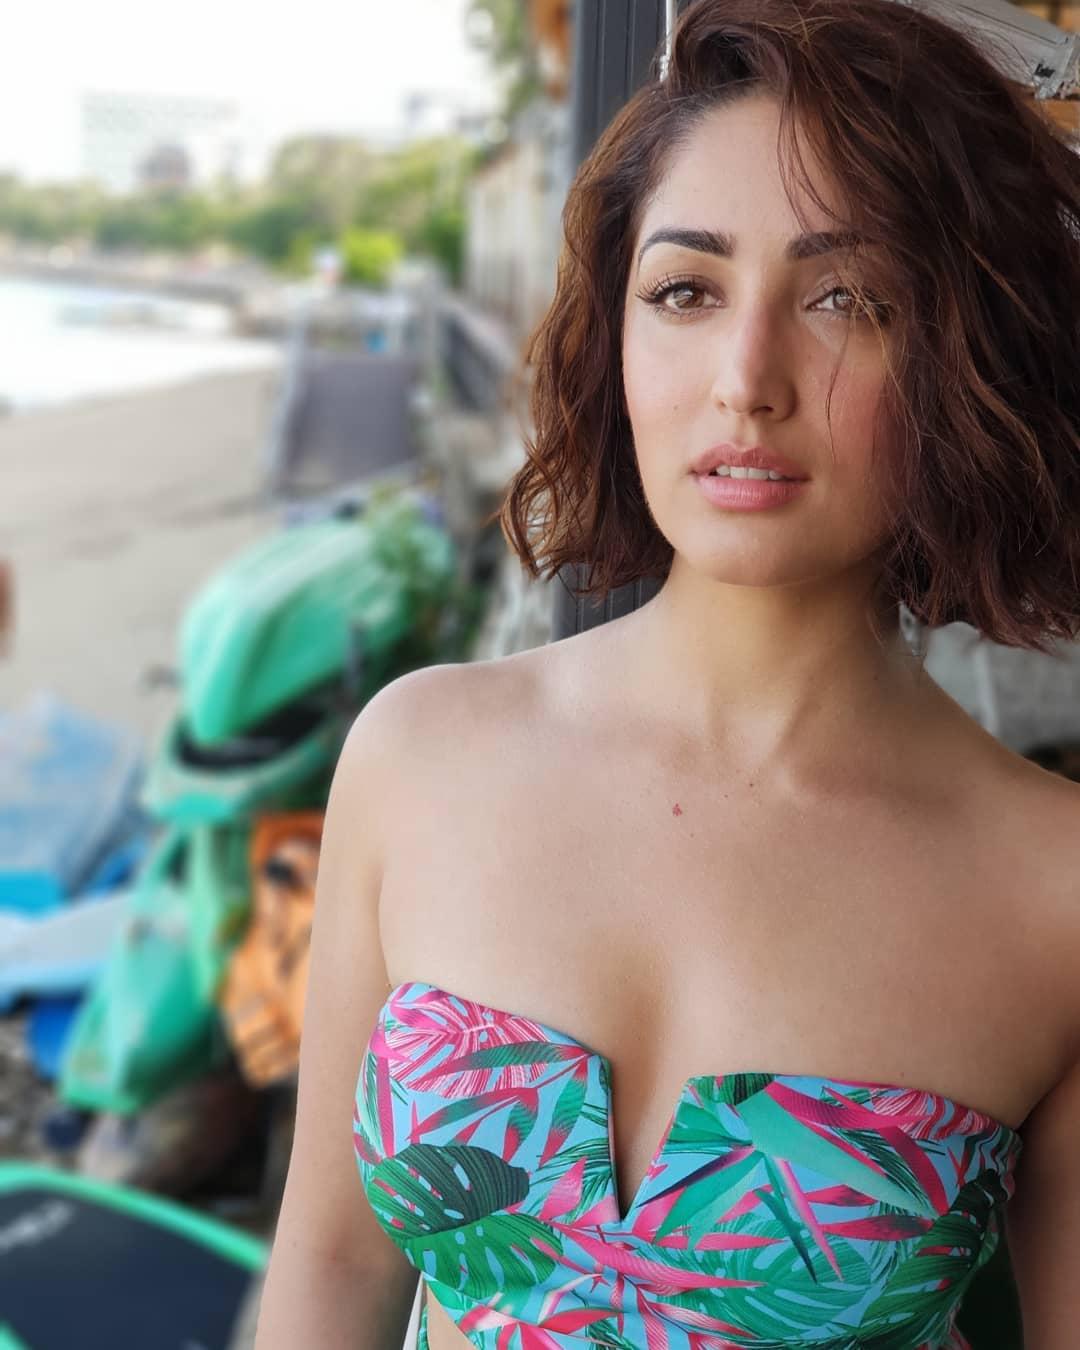 Yami Gautam hot, Yami Gautam sexy, Yami Gautam nude, Yami Gautam boobs,Yami Gautam photos